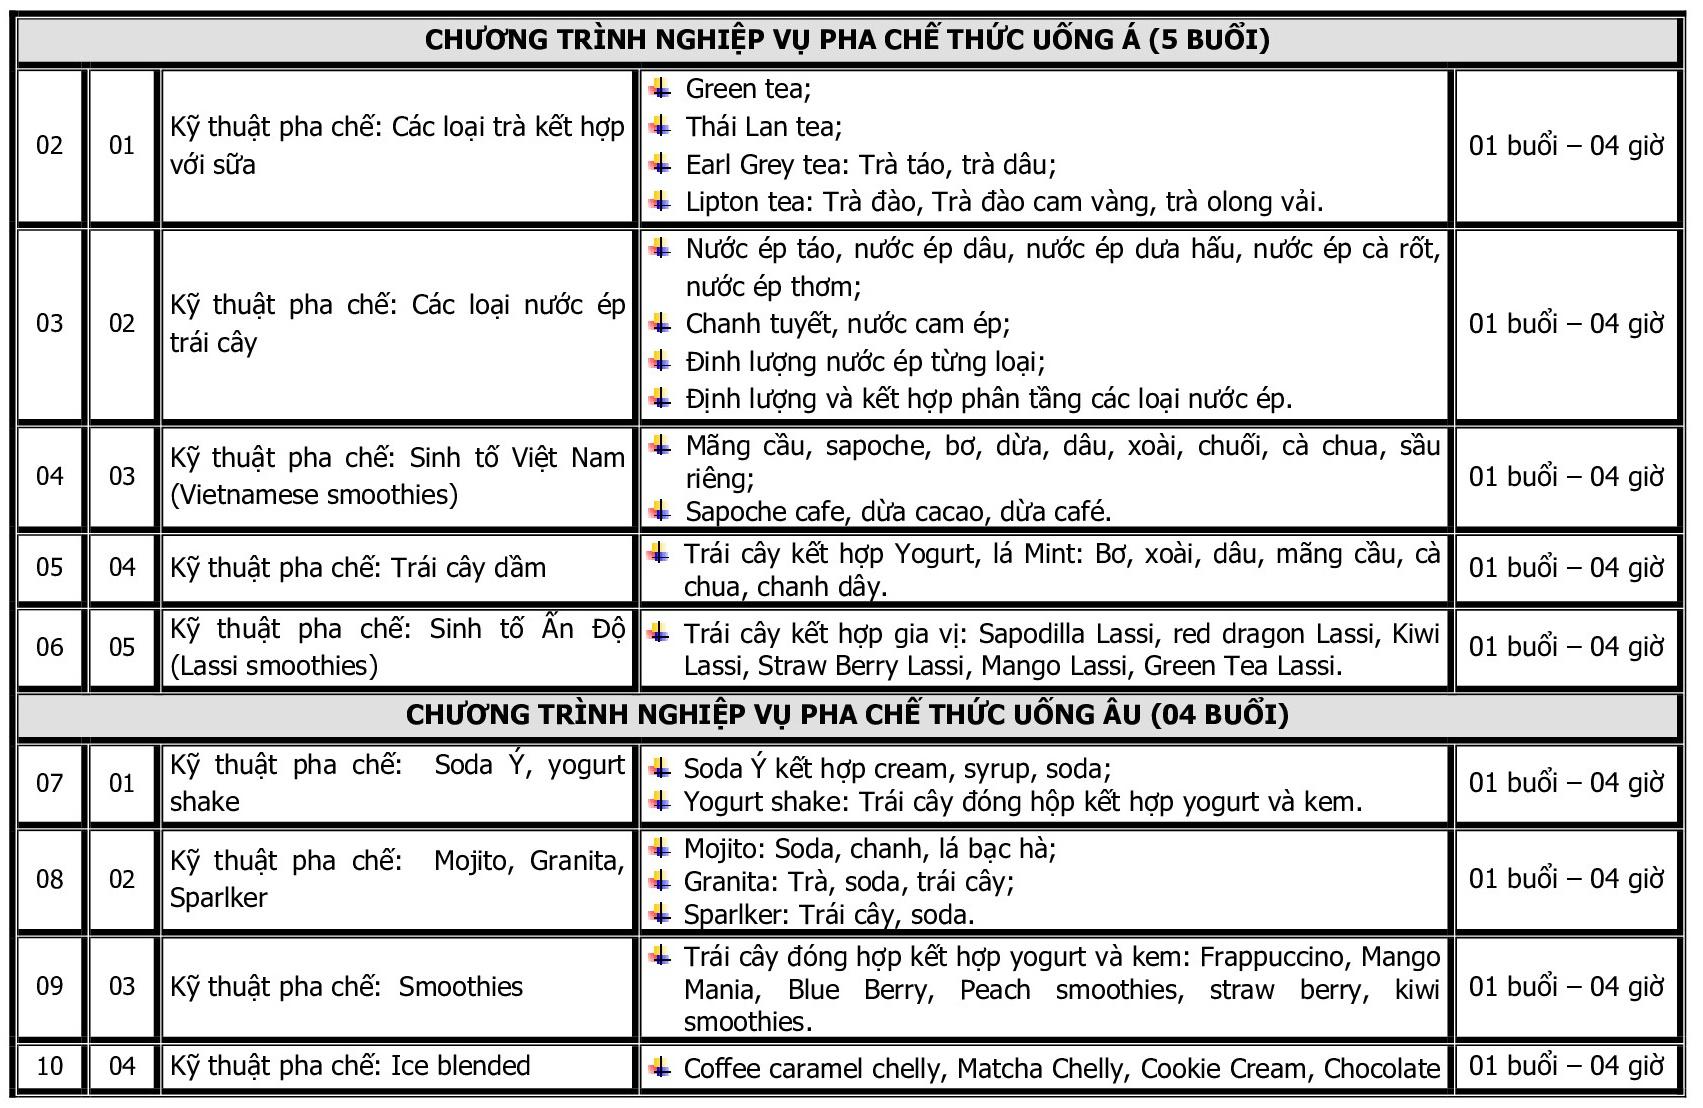 CT DAO TAO THUC HANH BAC TRUNG CAP_p002